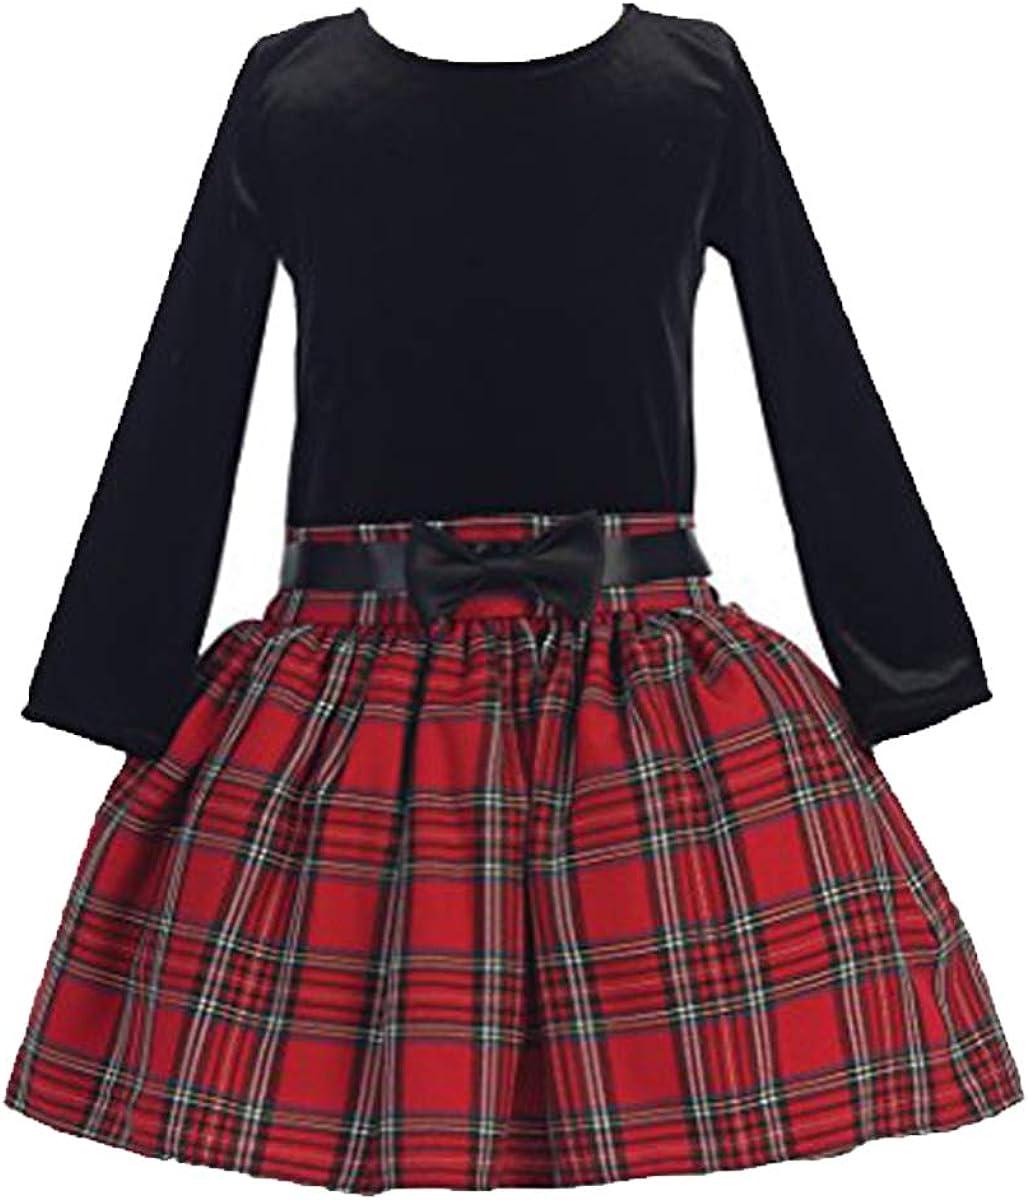 Girls size 3t Christmas dress